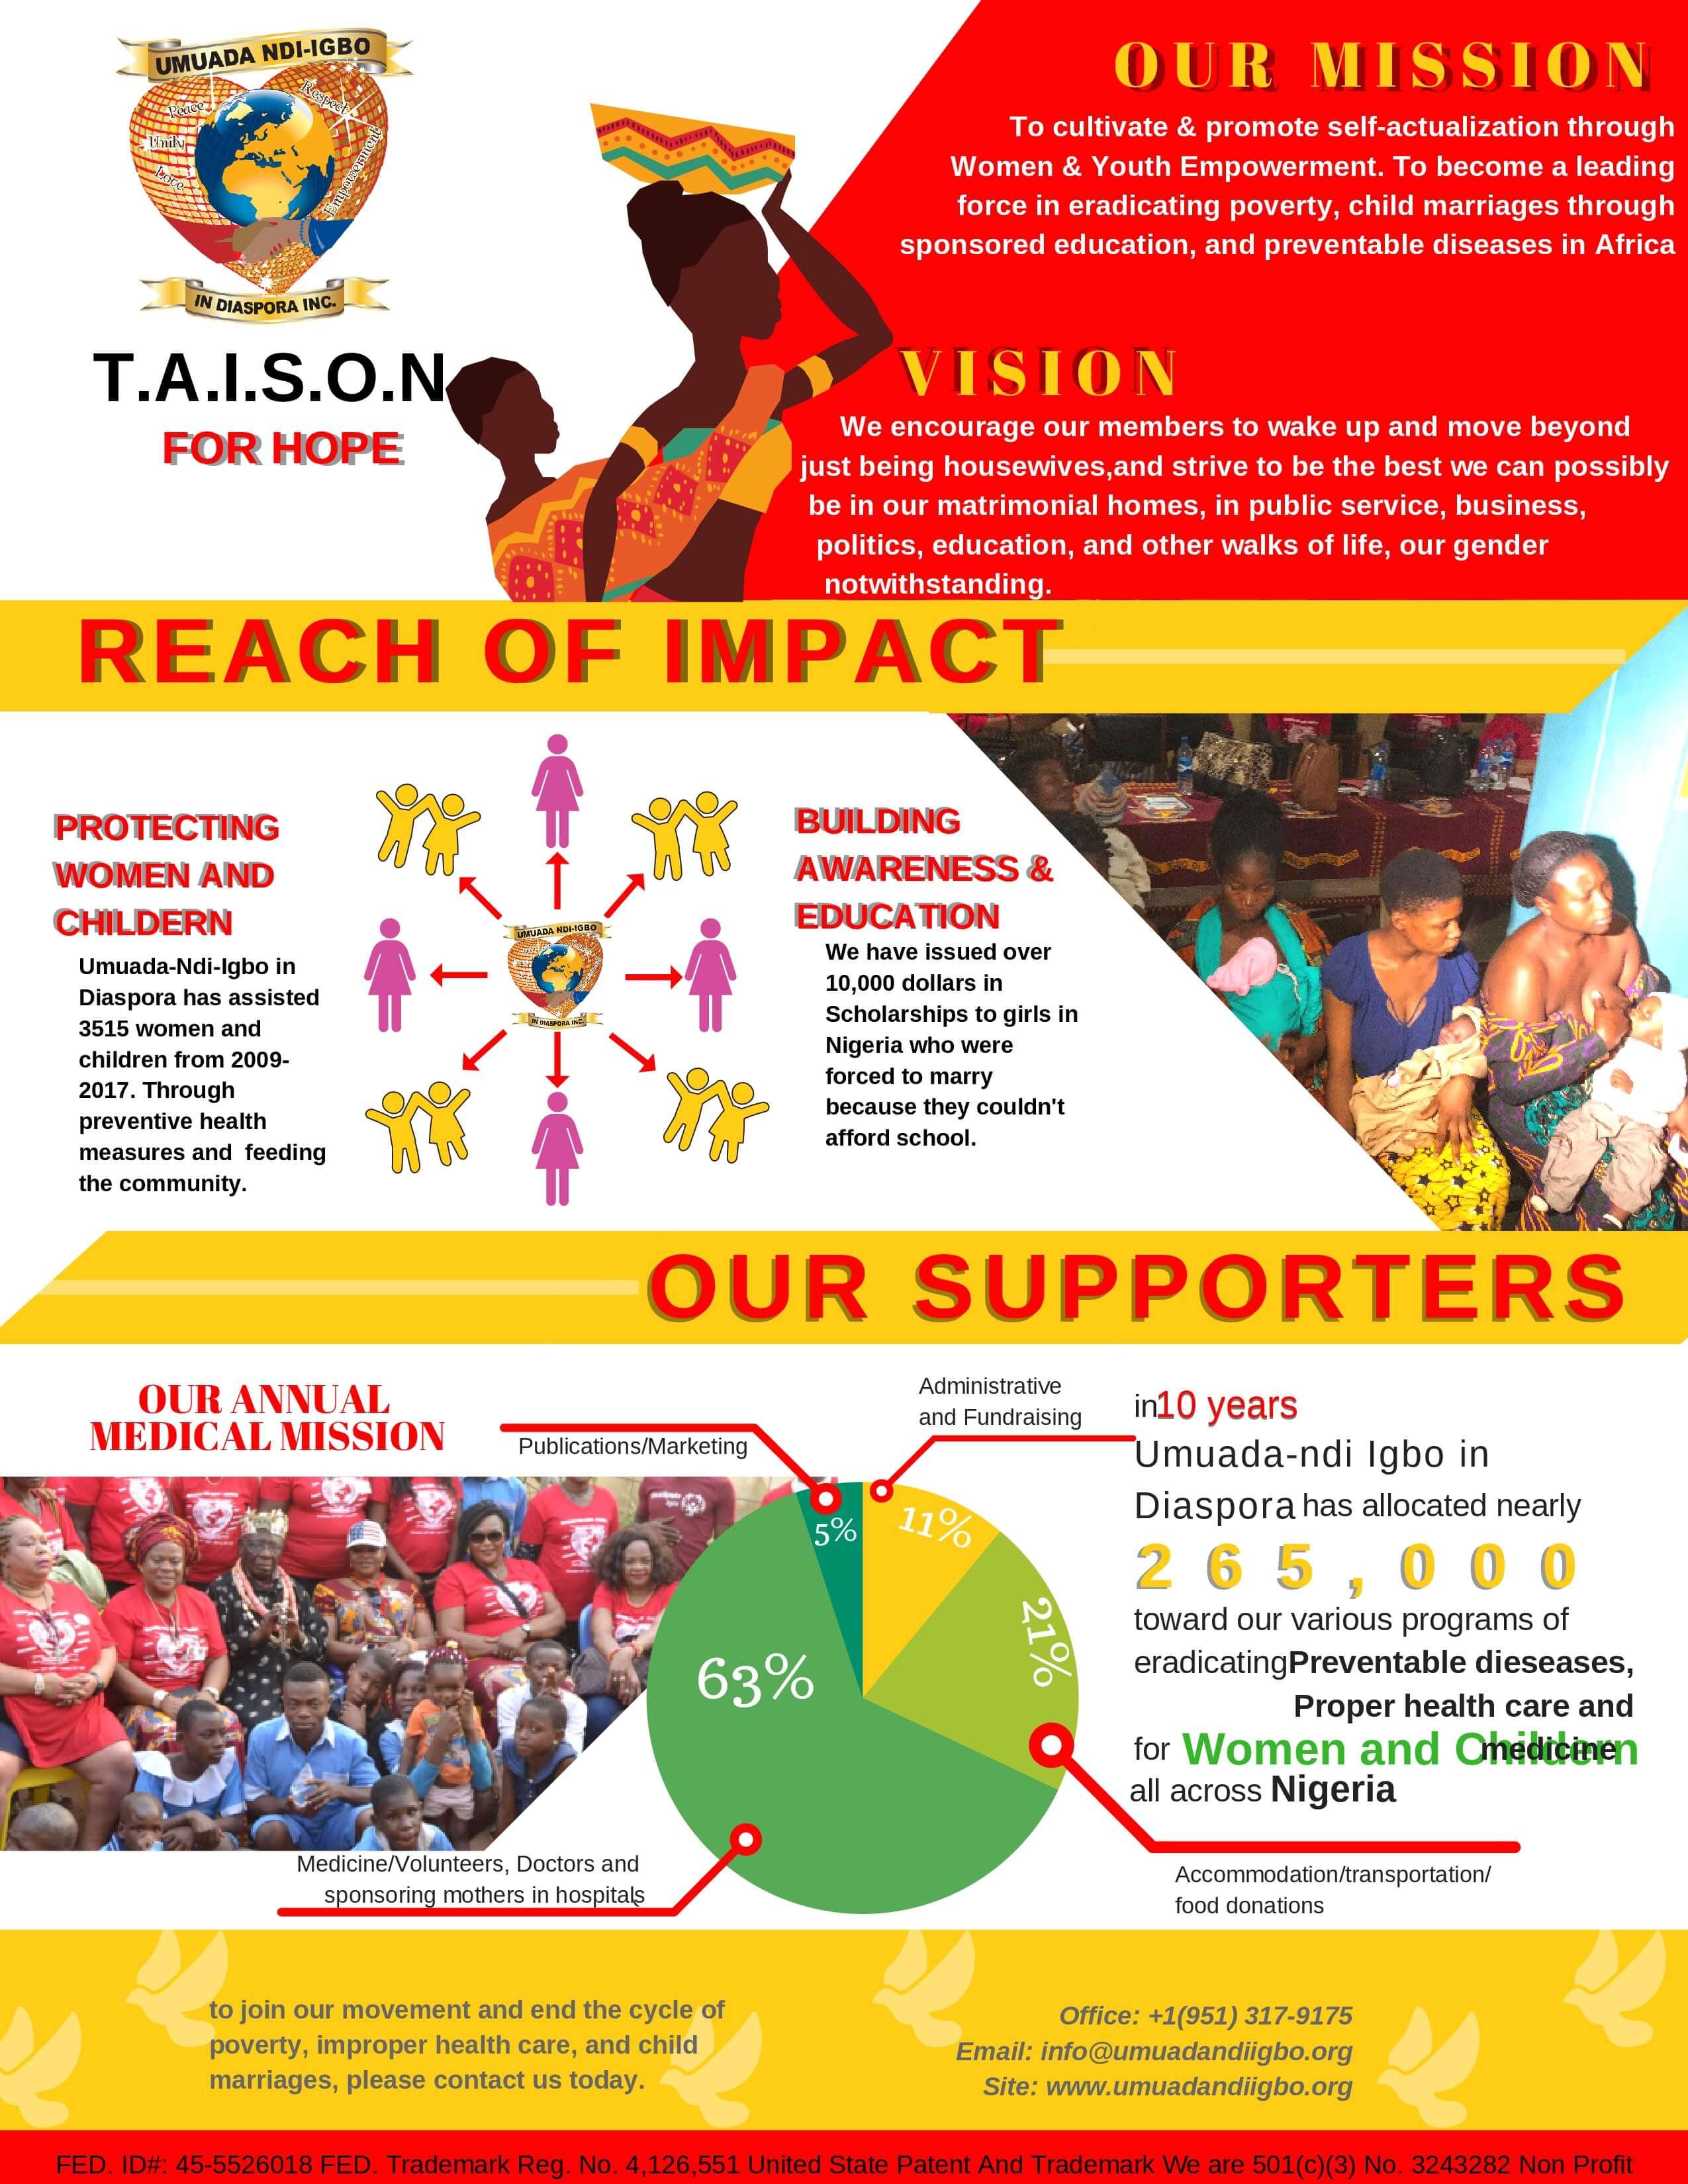 Taison For Hope